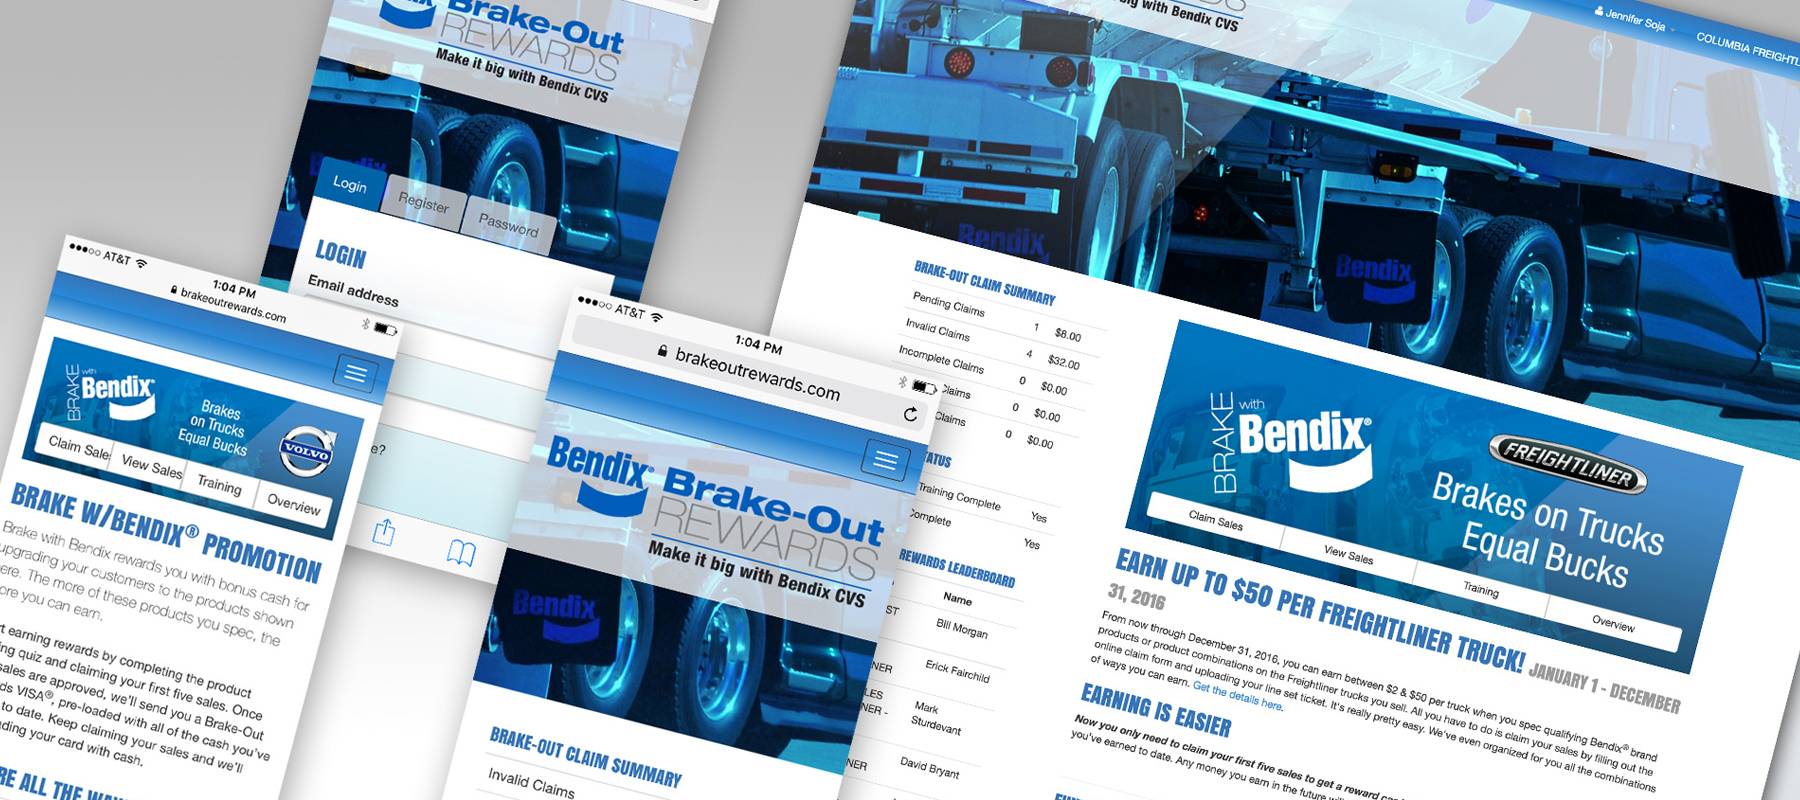 Bendix Brake-Out Rewards Incentive Program